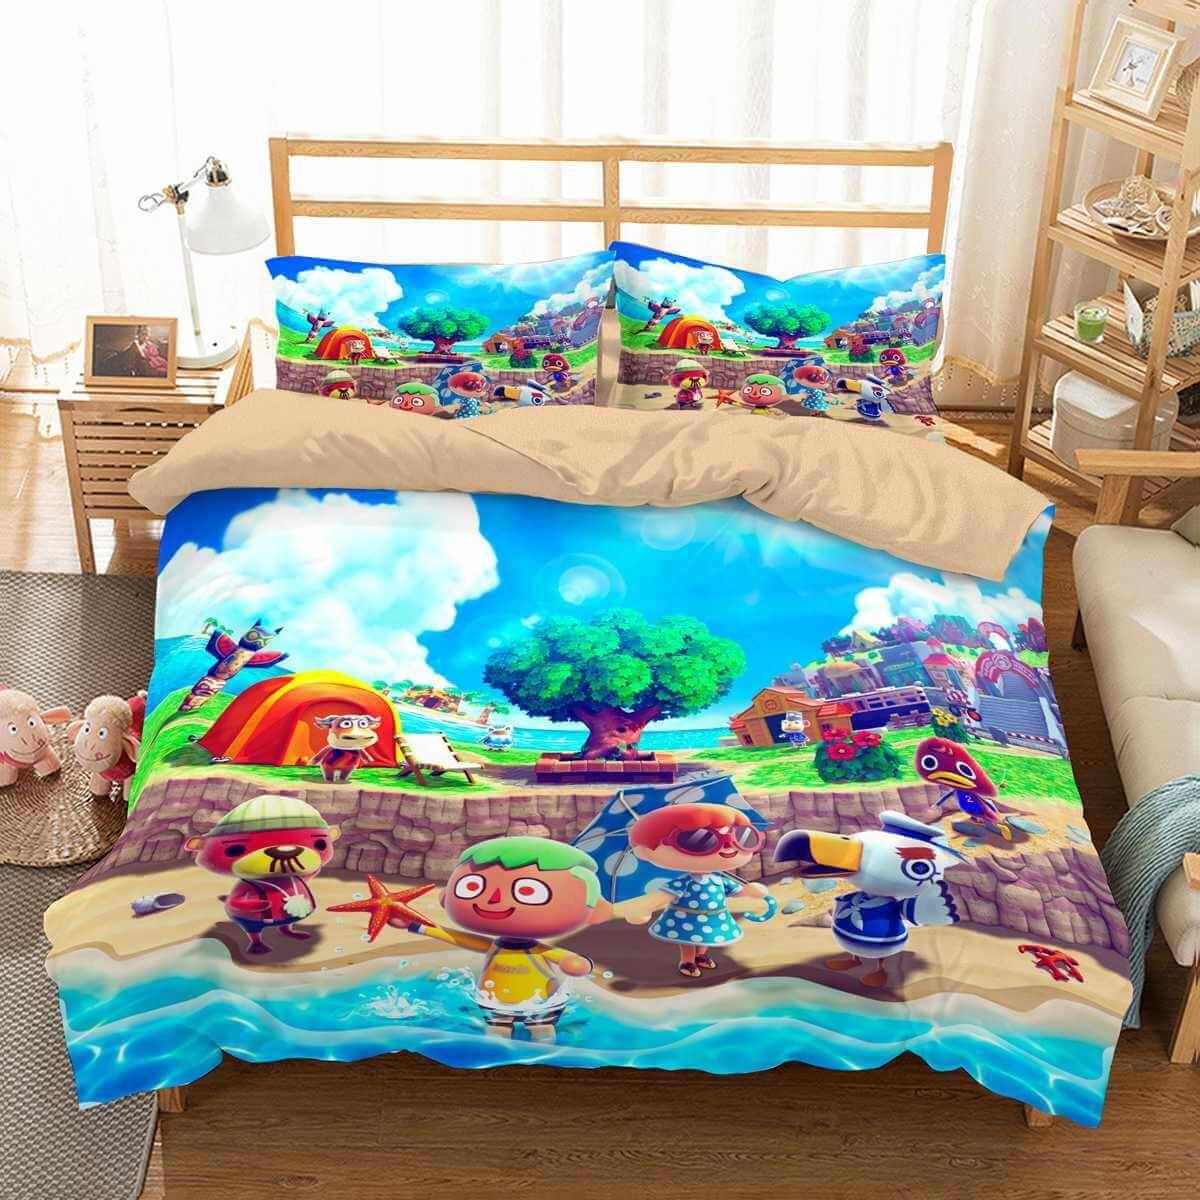 05542fe4d029 3D Customize Animal Crossing Bedding Set Duvet Cover Set Bedroom Set  Bedlinen